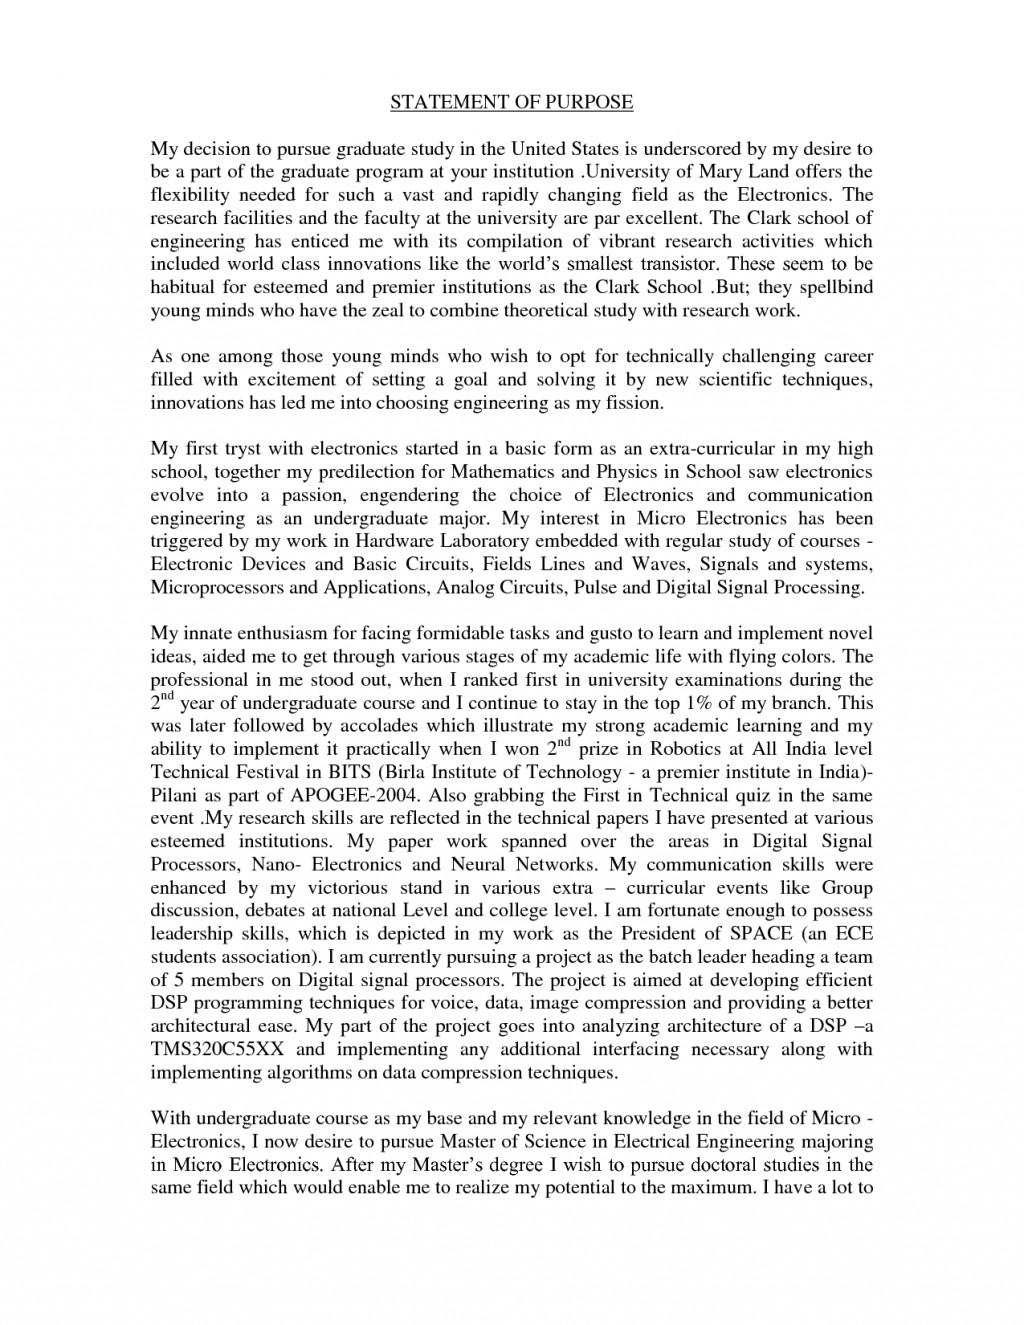 007 Essay Example Statement Of Interest Sample Template M80ewg4r Usc Sensational Prompt Prompts Engineering 2017 Large